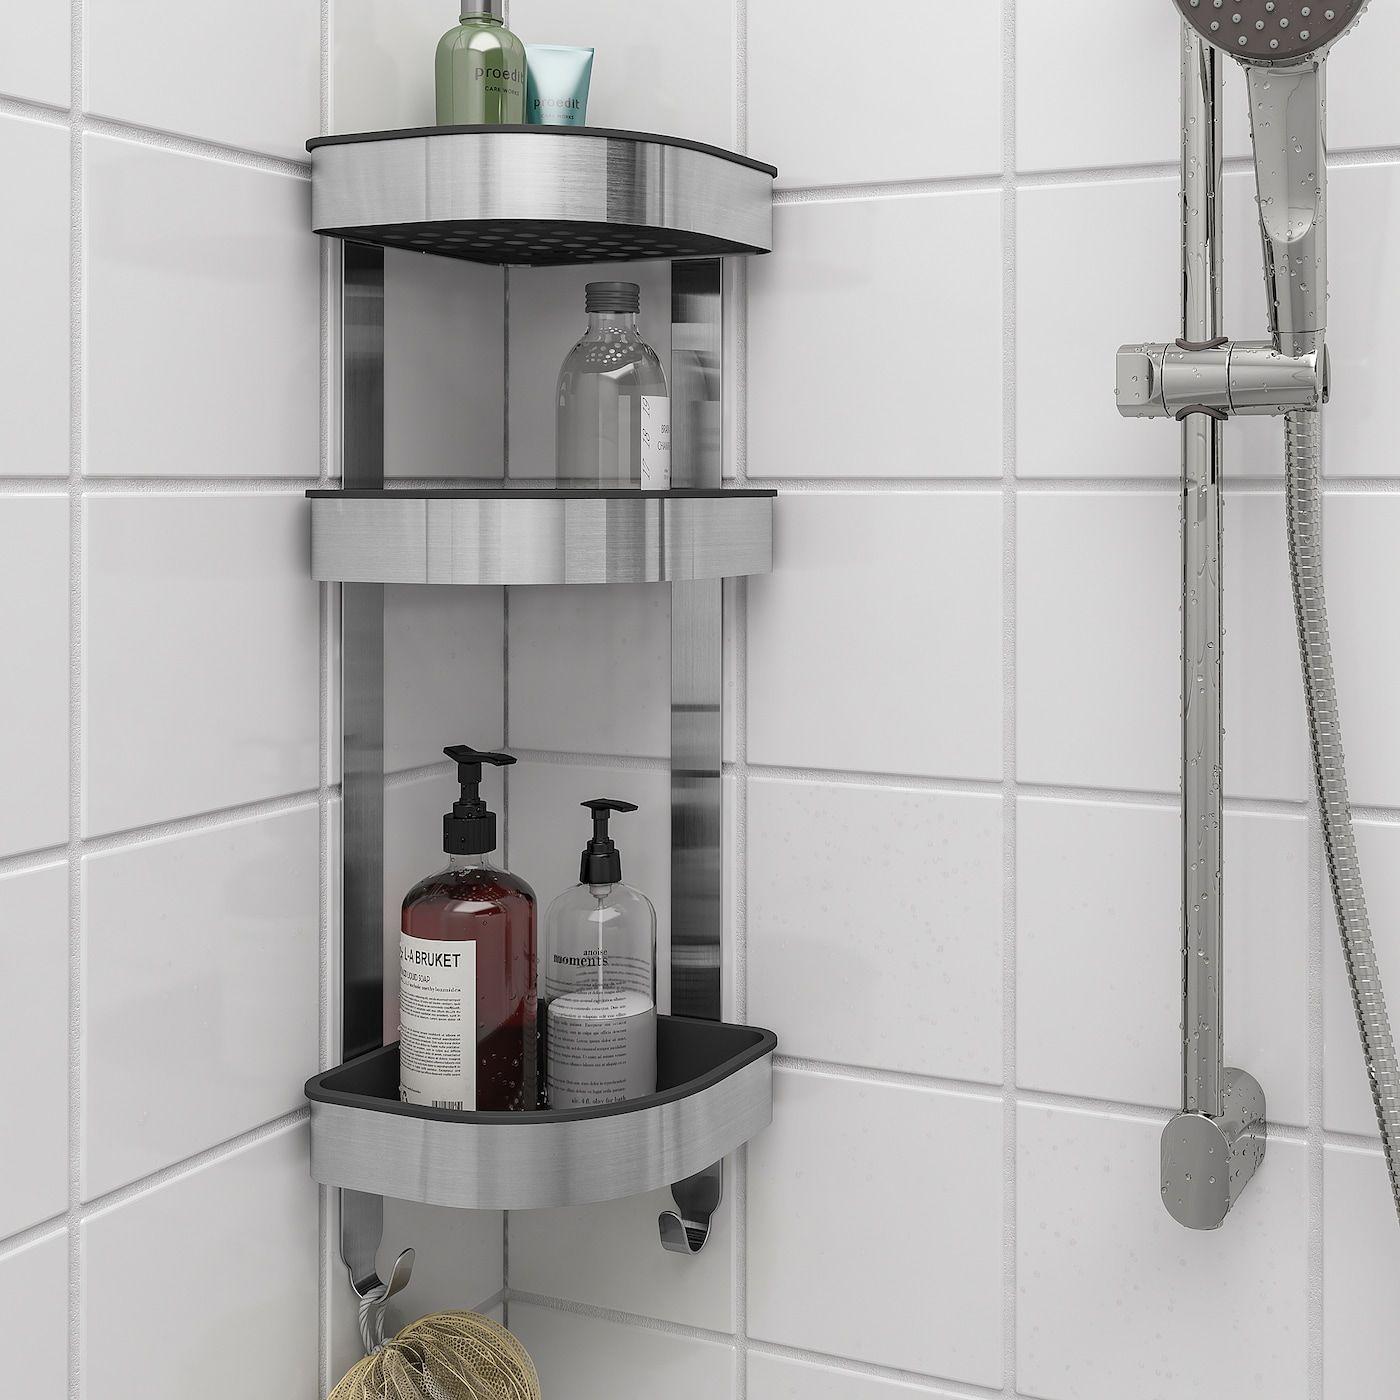 Brogrund Corner Wall Shelf Unit Stainless Steel 19x58 Cm